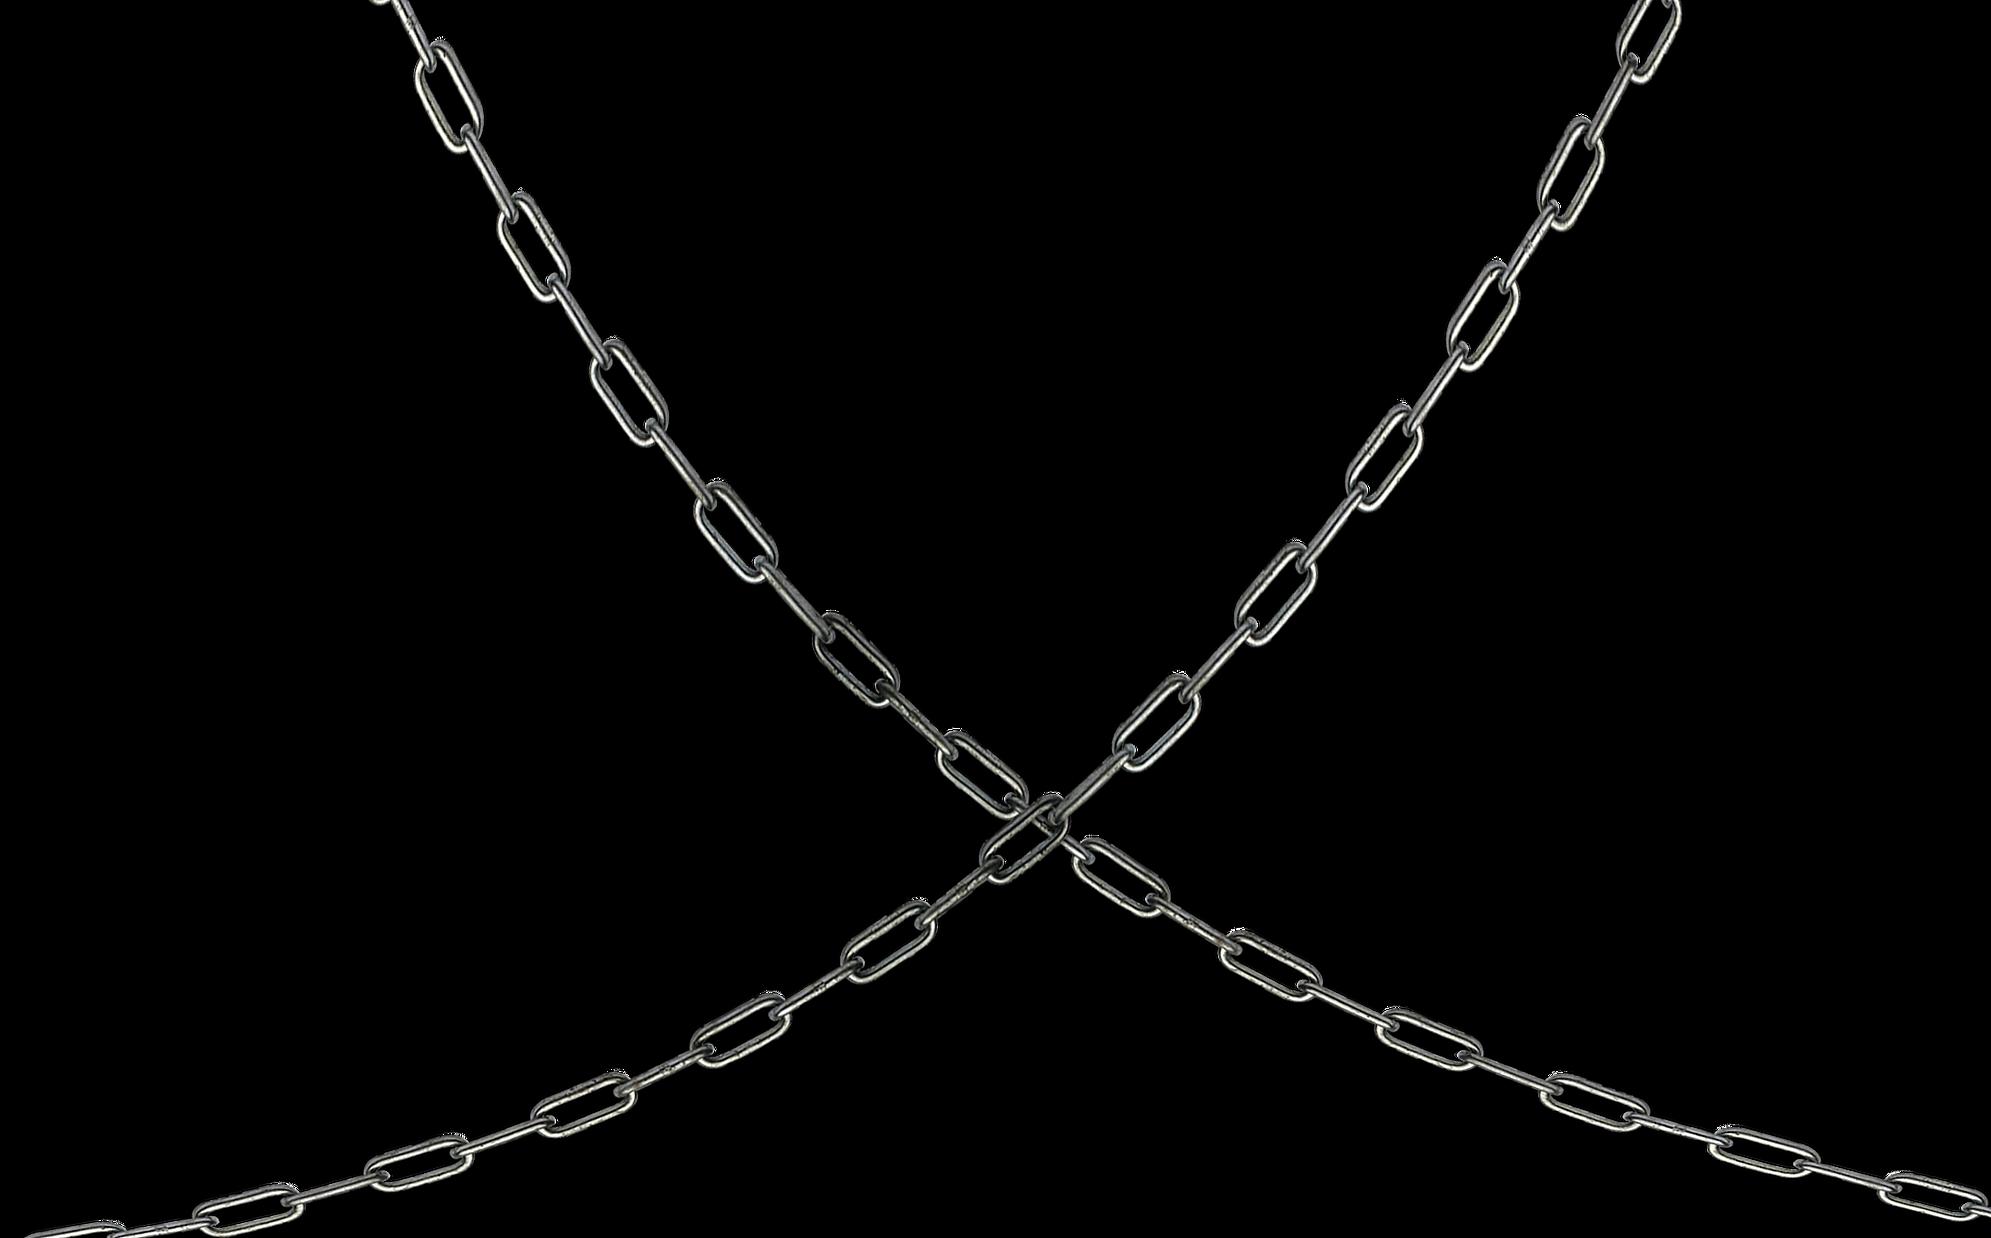 Chain Clip art.